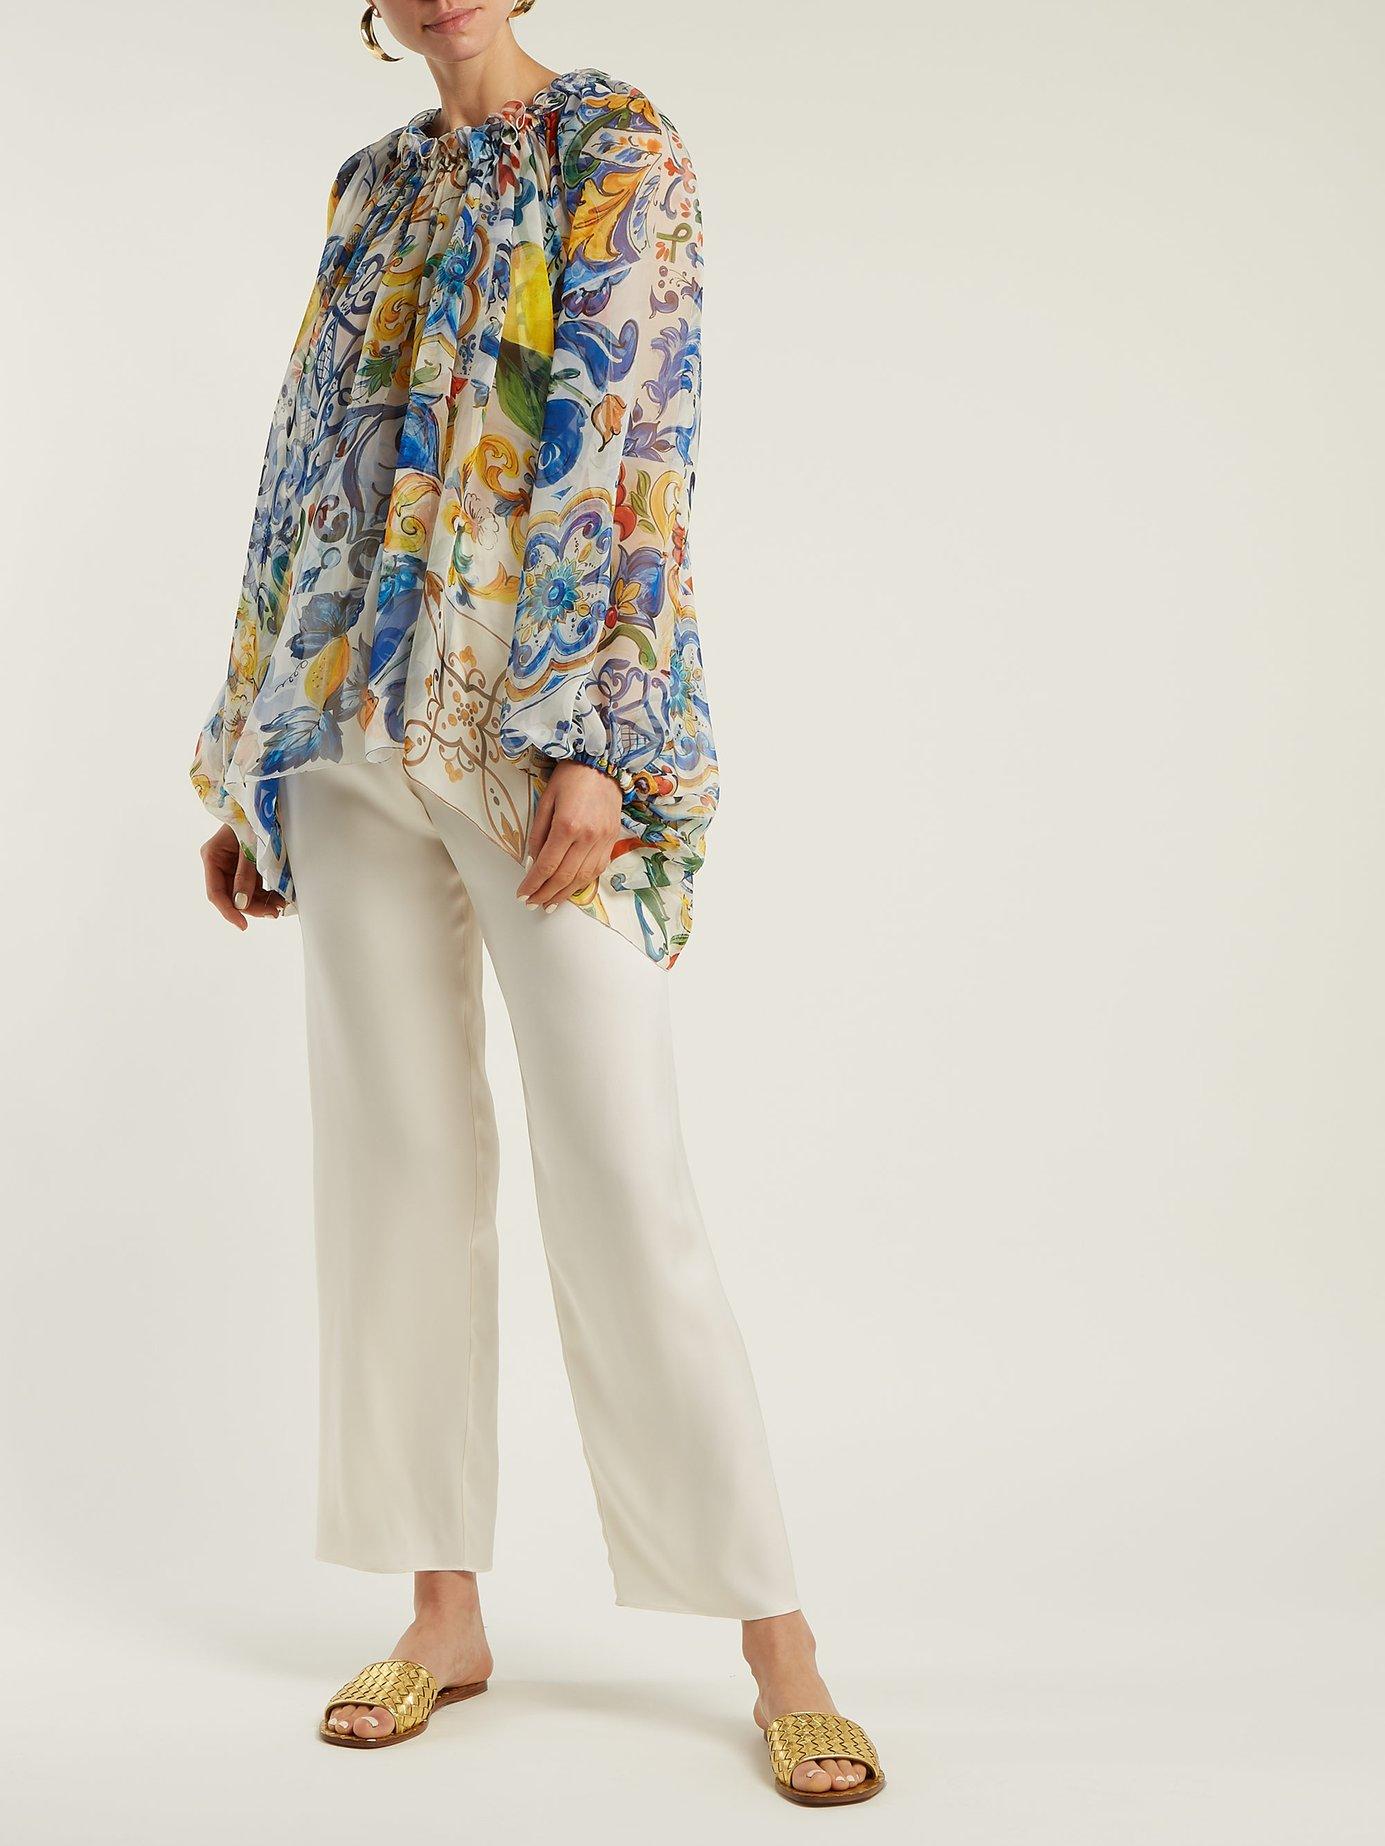 Majolica-print silk-chiffon blouse by Dolce & Gabbana